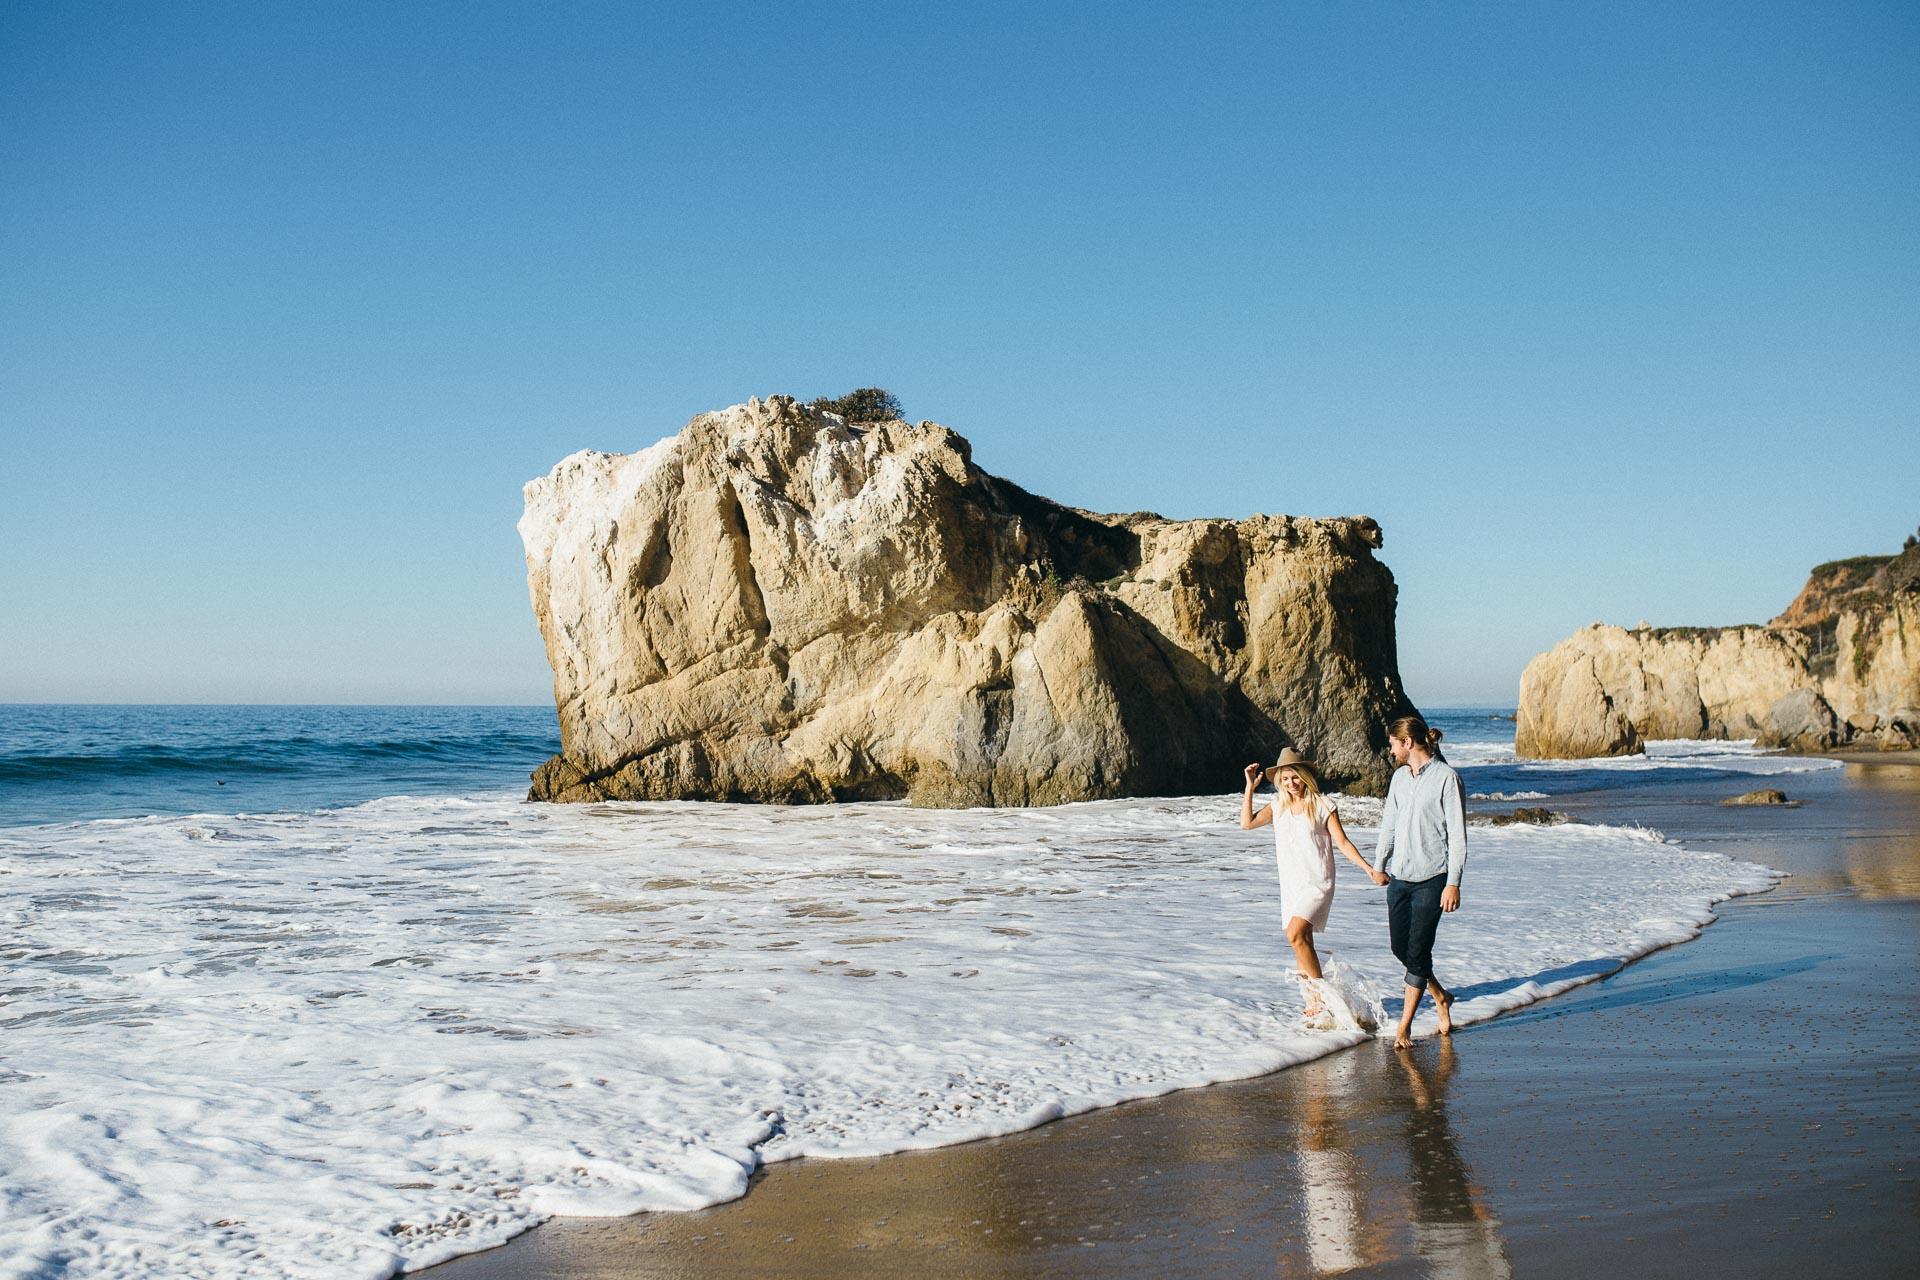 Carley_Jake_Lovesession_California_LosAngeles_ElMatadorBeach_JeanLaurentGaudy_047